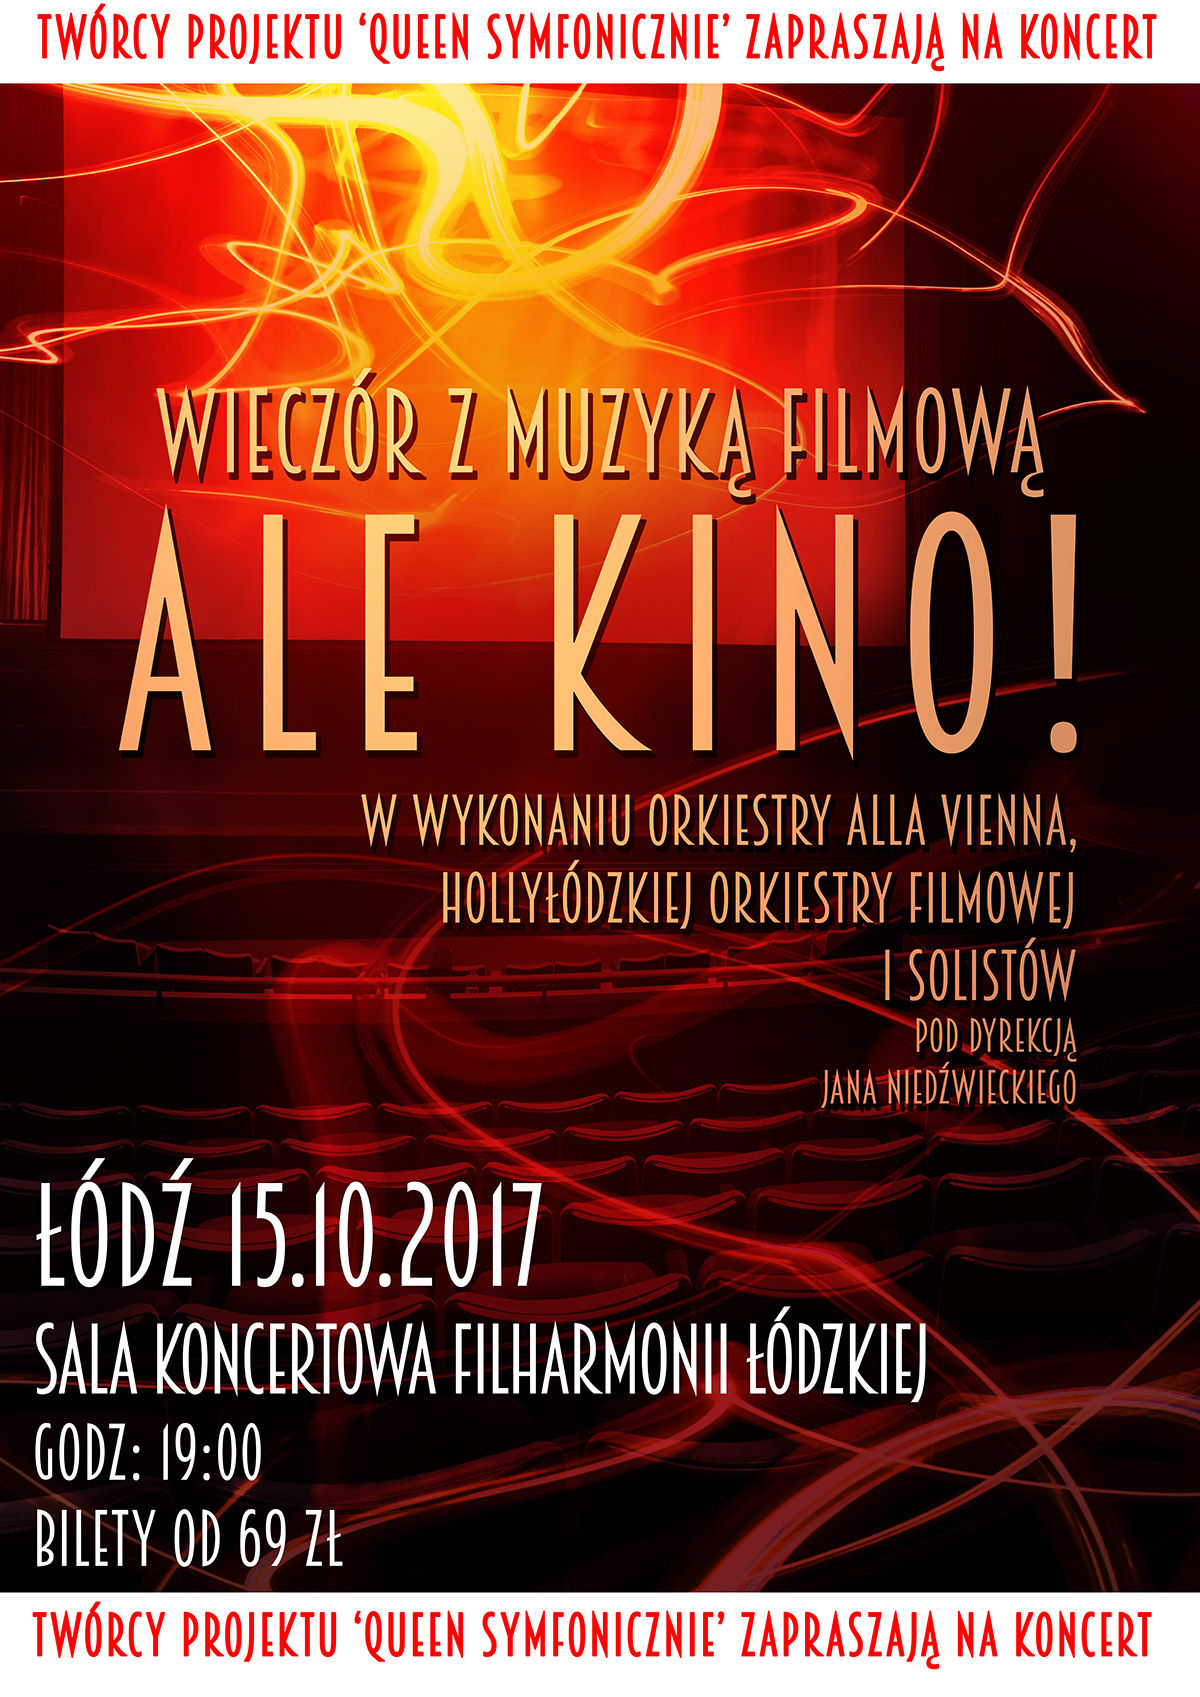 alekino_lodz